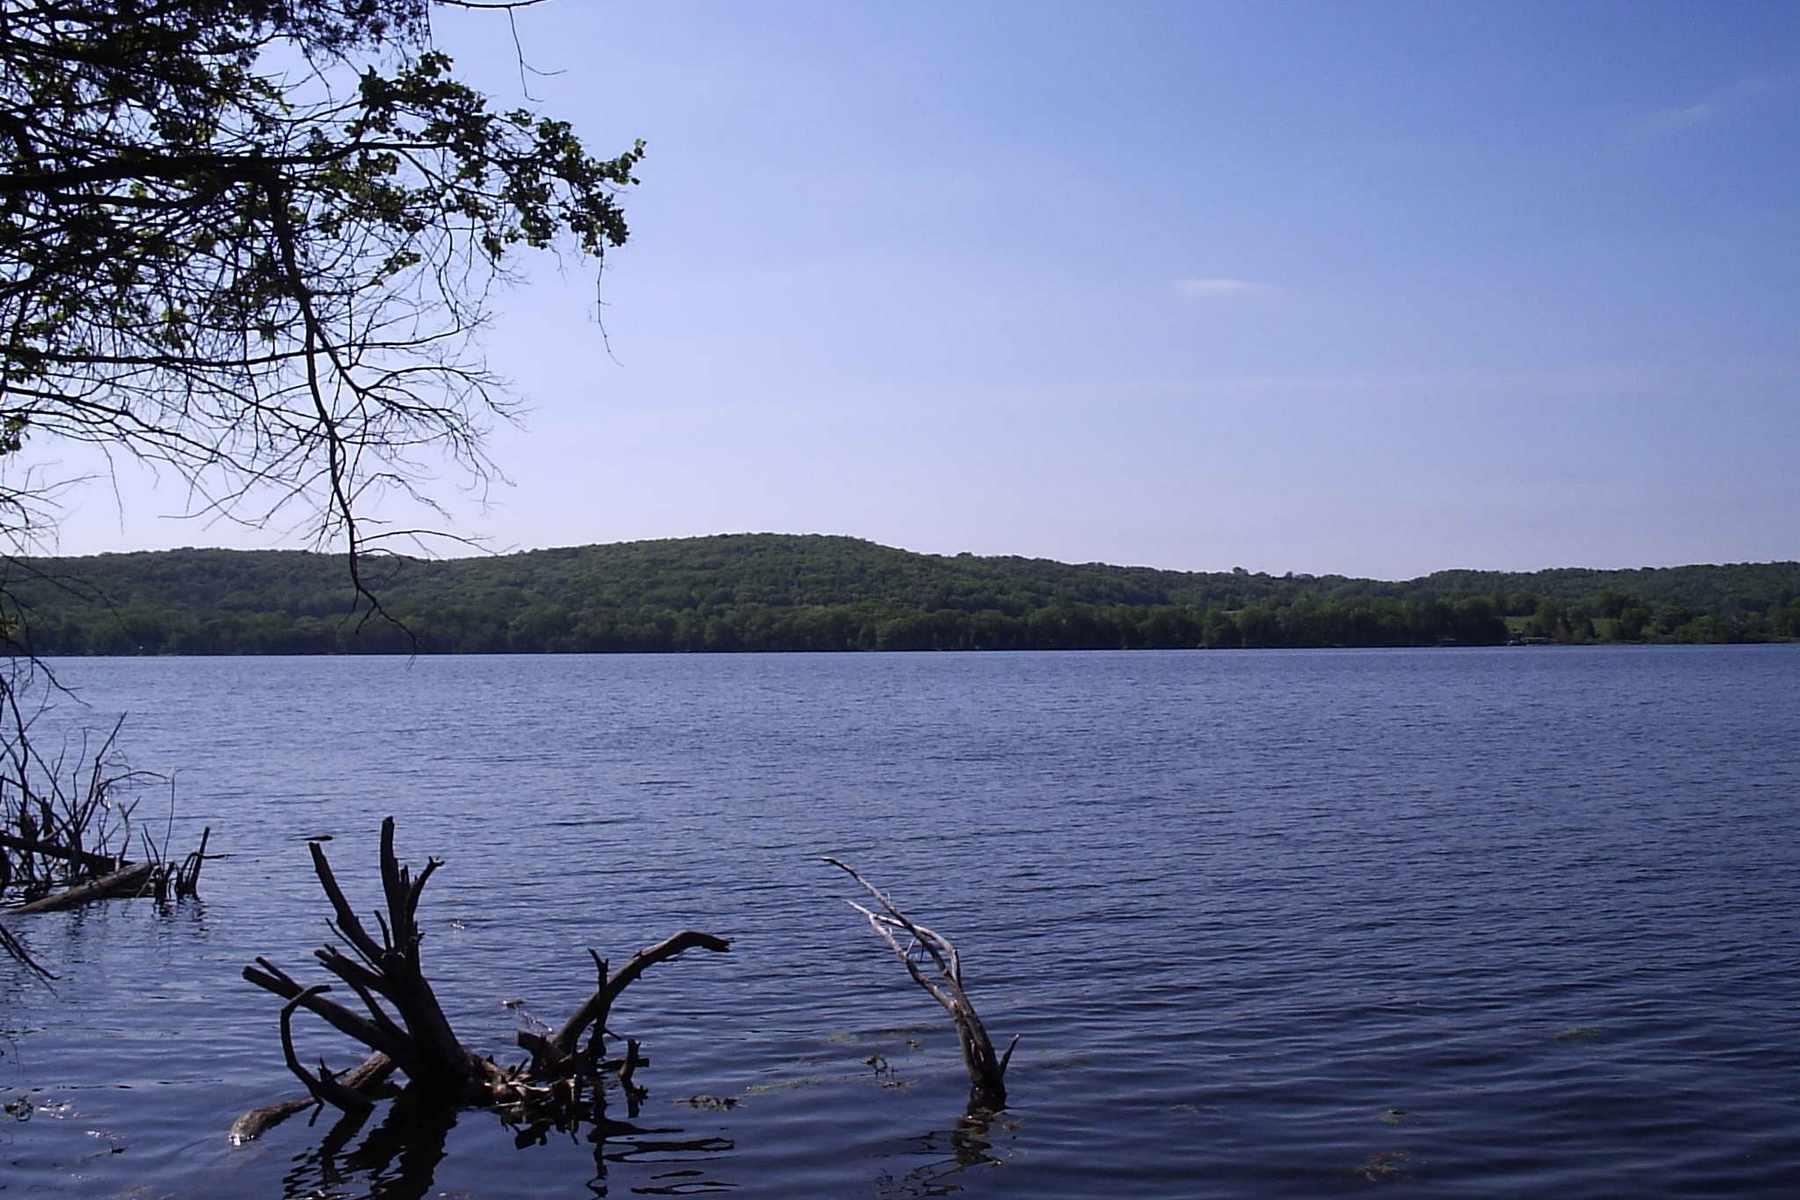 Land for Sale at Fish Lake Acreage 8679 Schoepp Road Sauk City, Wisconsin 53583 United States